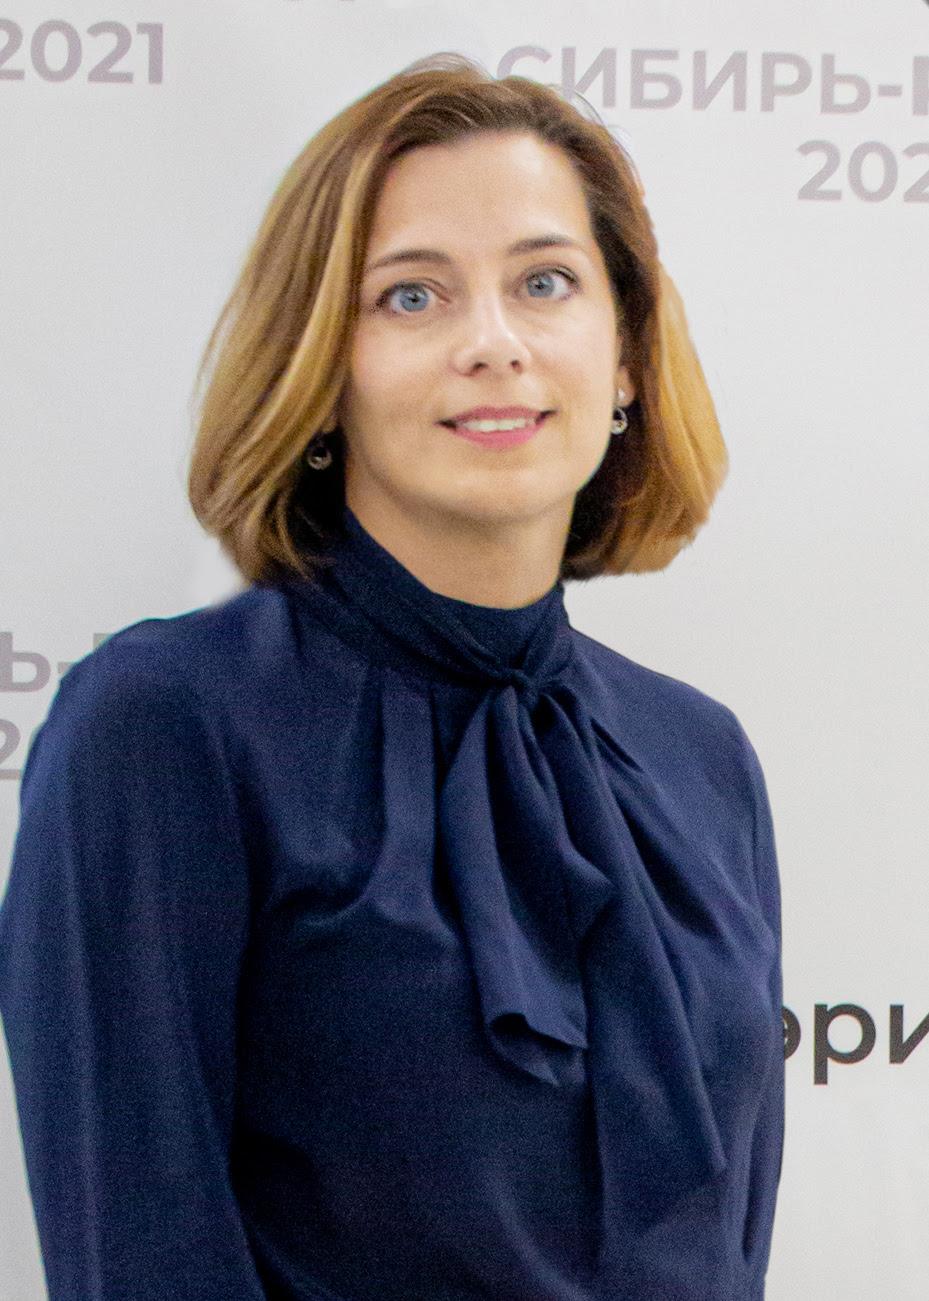 Курсы СПОК в Краснодаре